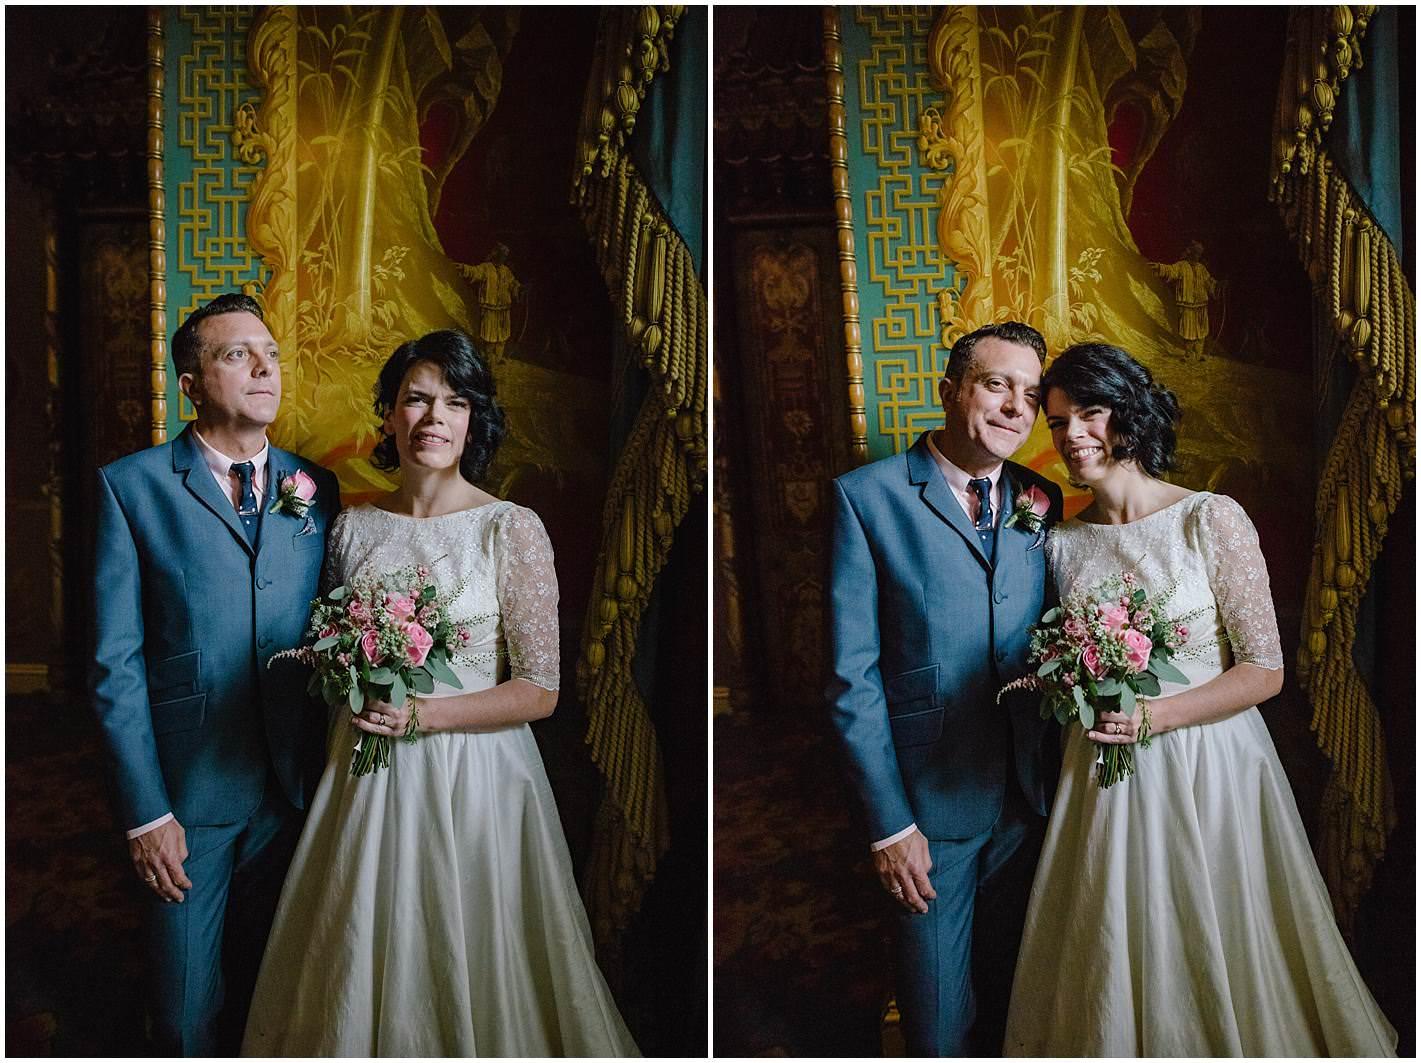 royal-pavilion-wedding-brighton386